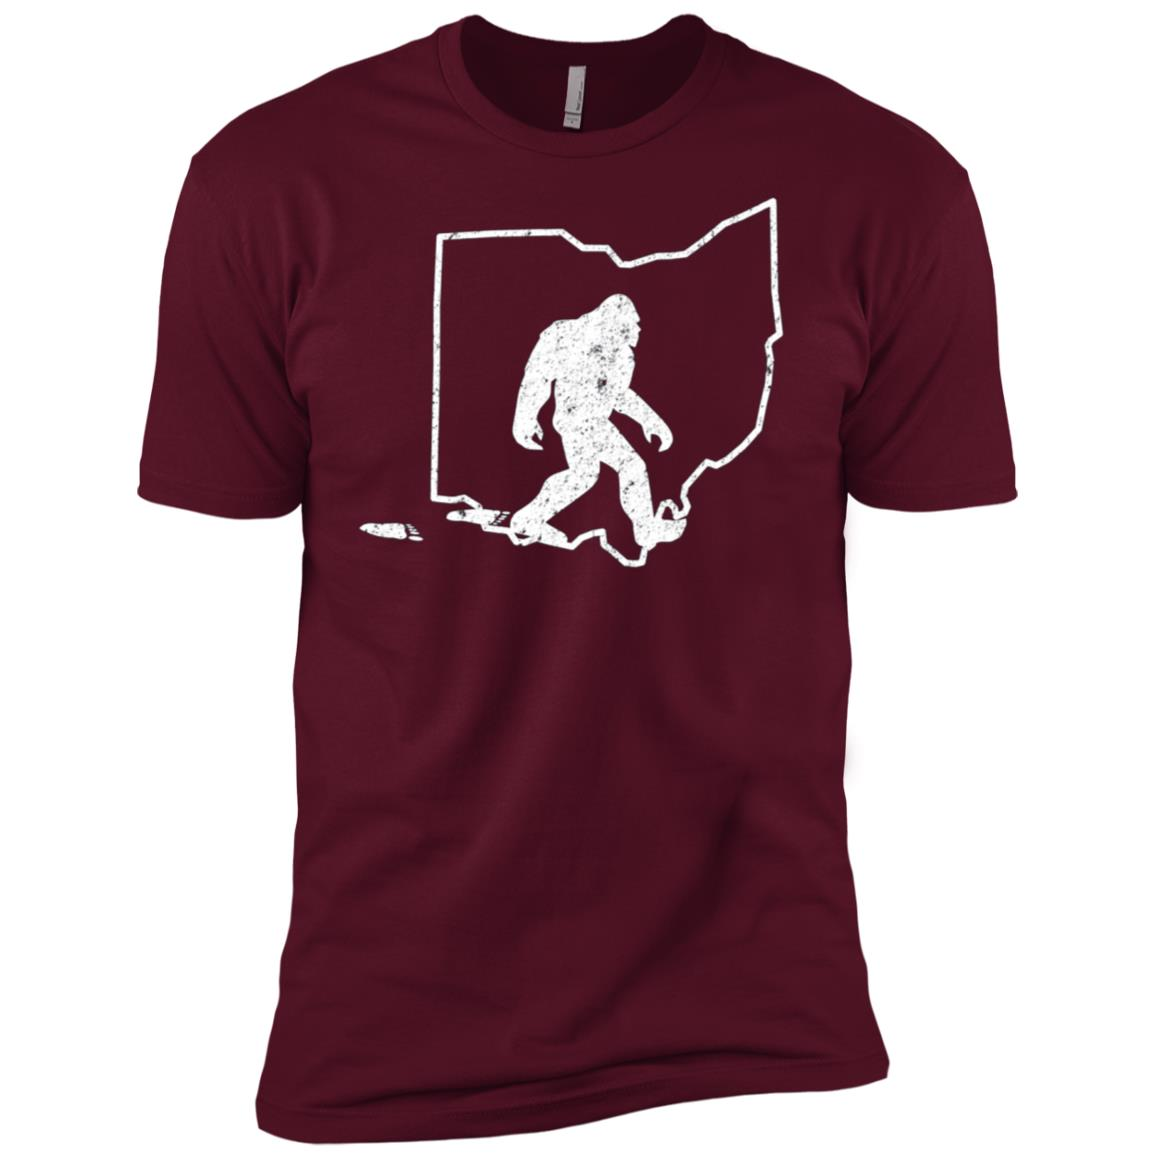 State of Ohio Vintage Pride Bigfoot Hunter Men Short Sleeve T-Shirt